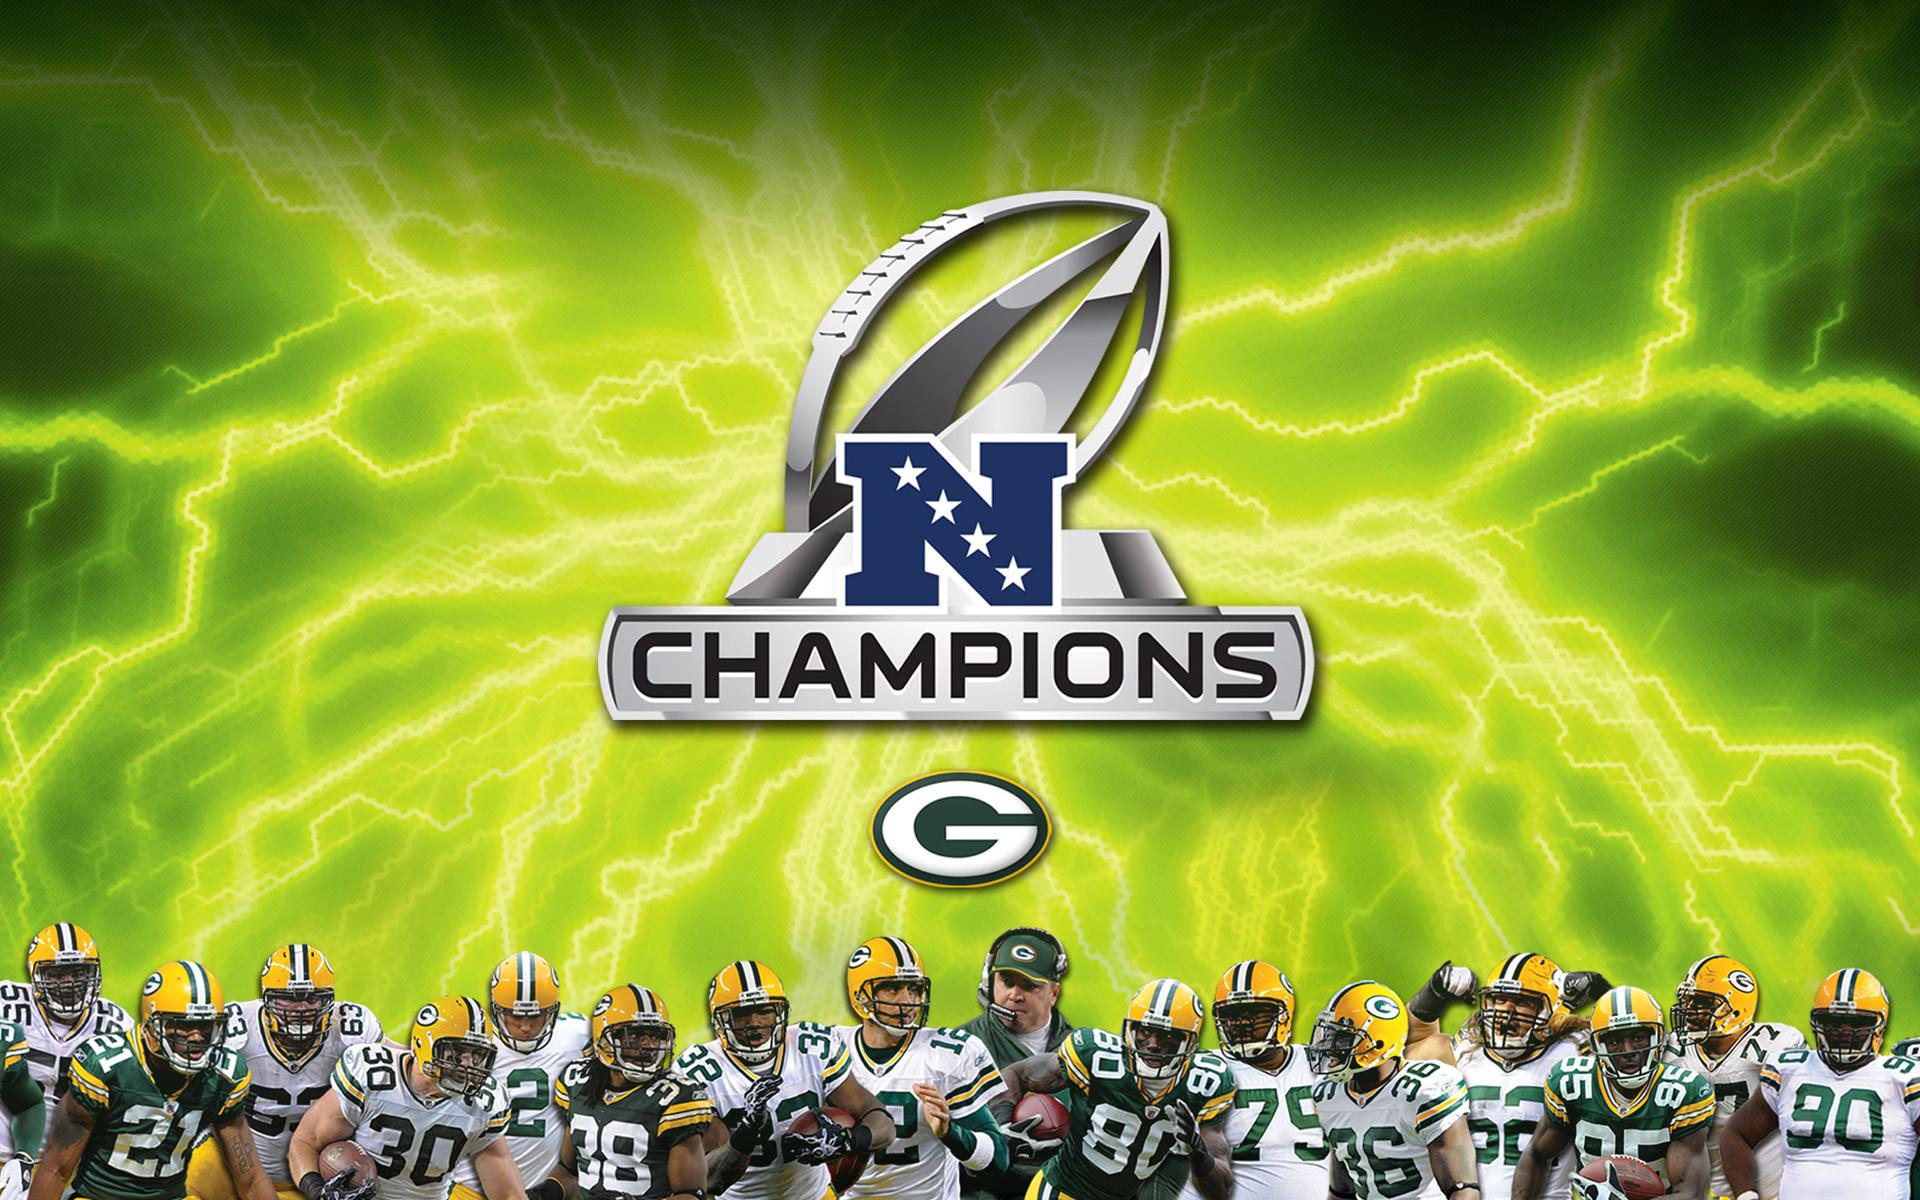 Green Bay Packers wallpaper wallpaper Green Bay Packers 1920x1200